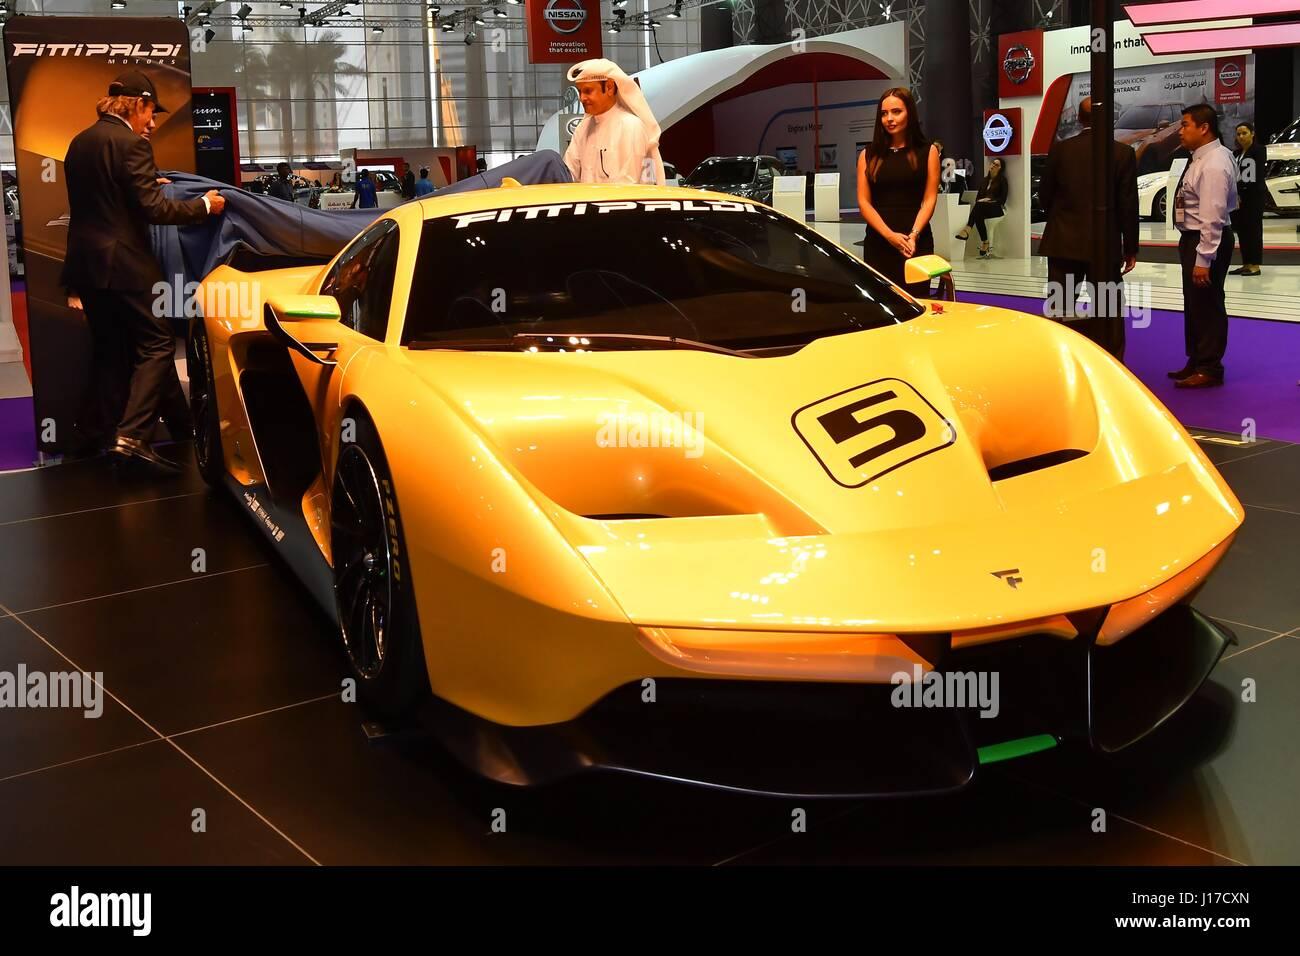 Doha, Capital of Qatar. 18th Apr, 2017. A Pininfarina SpA Fittipaldi EF7 Vision Gran Turismo racing automobile is - Stock Image